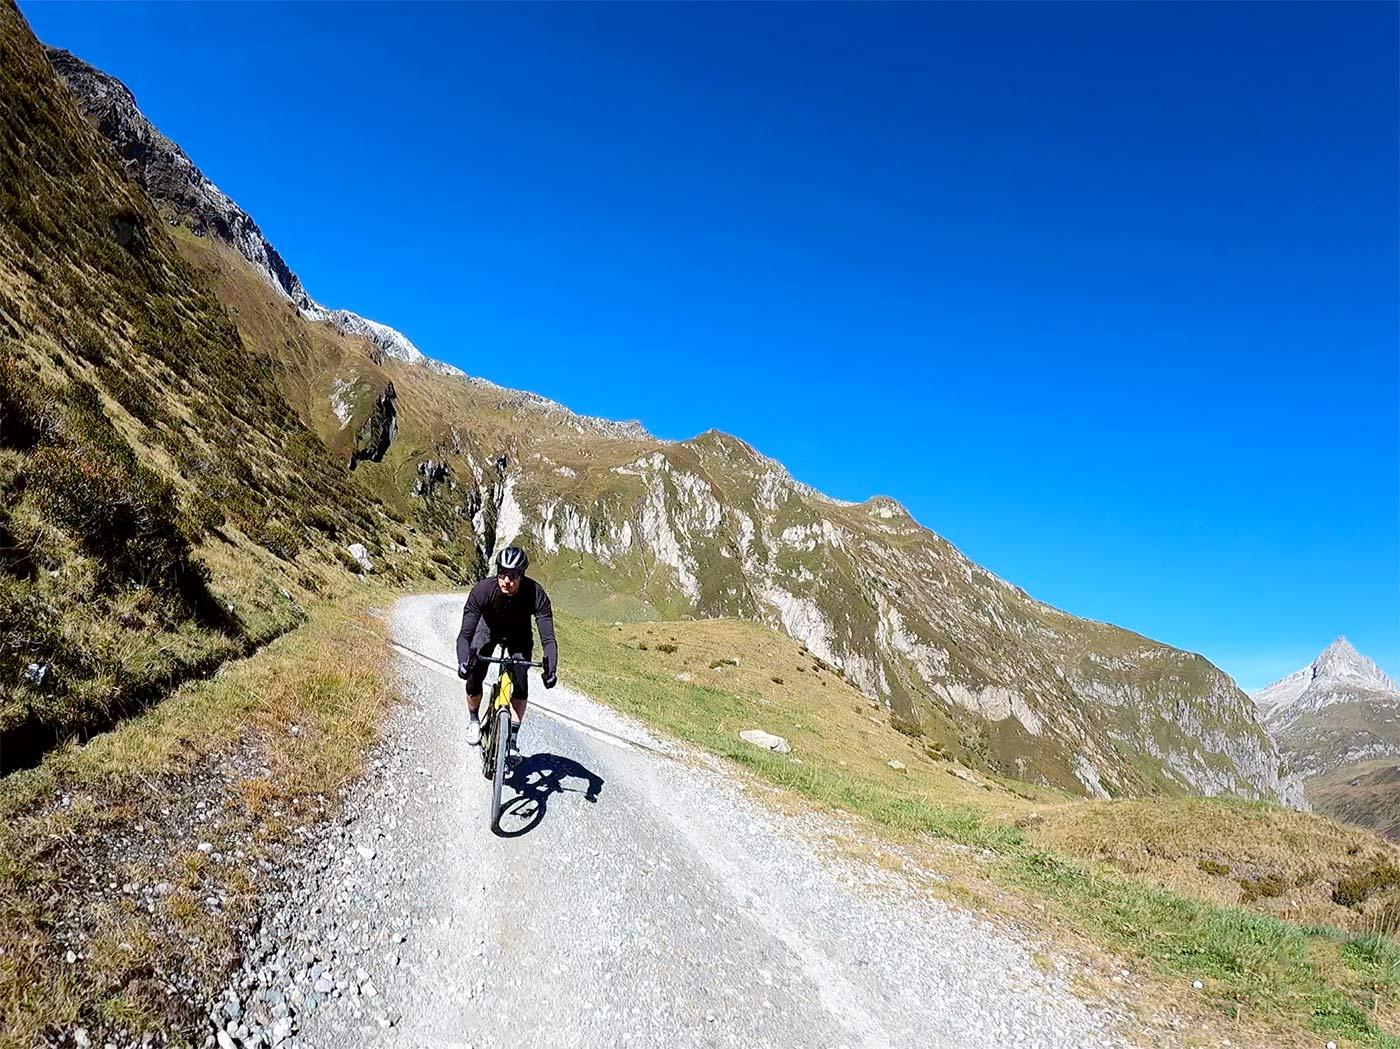 bmc urs lt full suspension gravel bike review ride down a mountain pass in switzerland